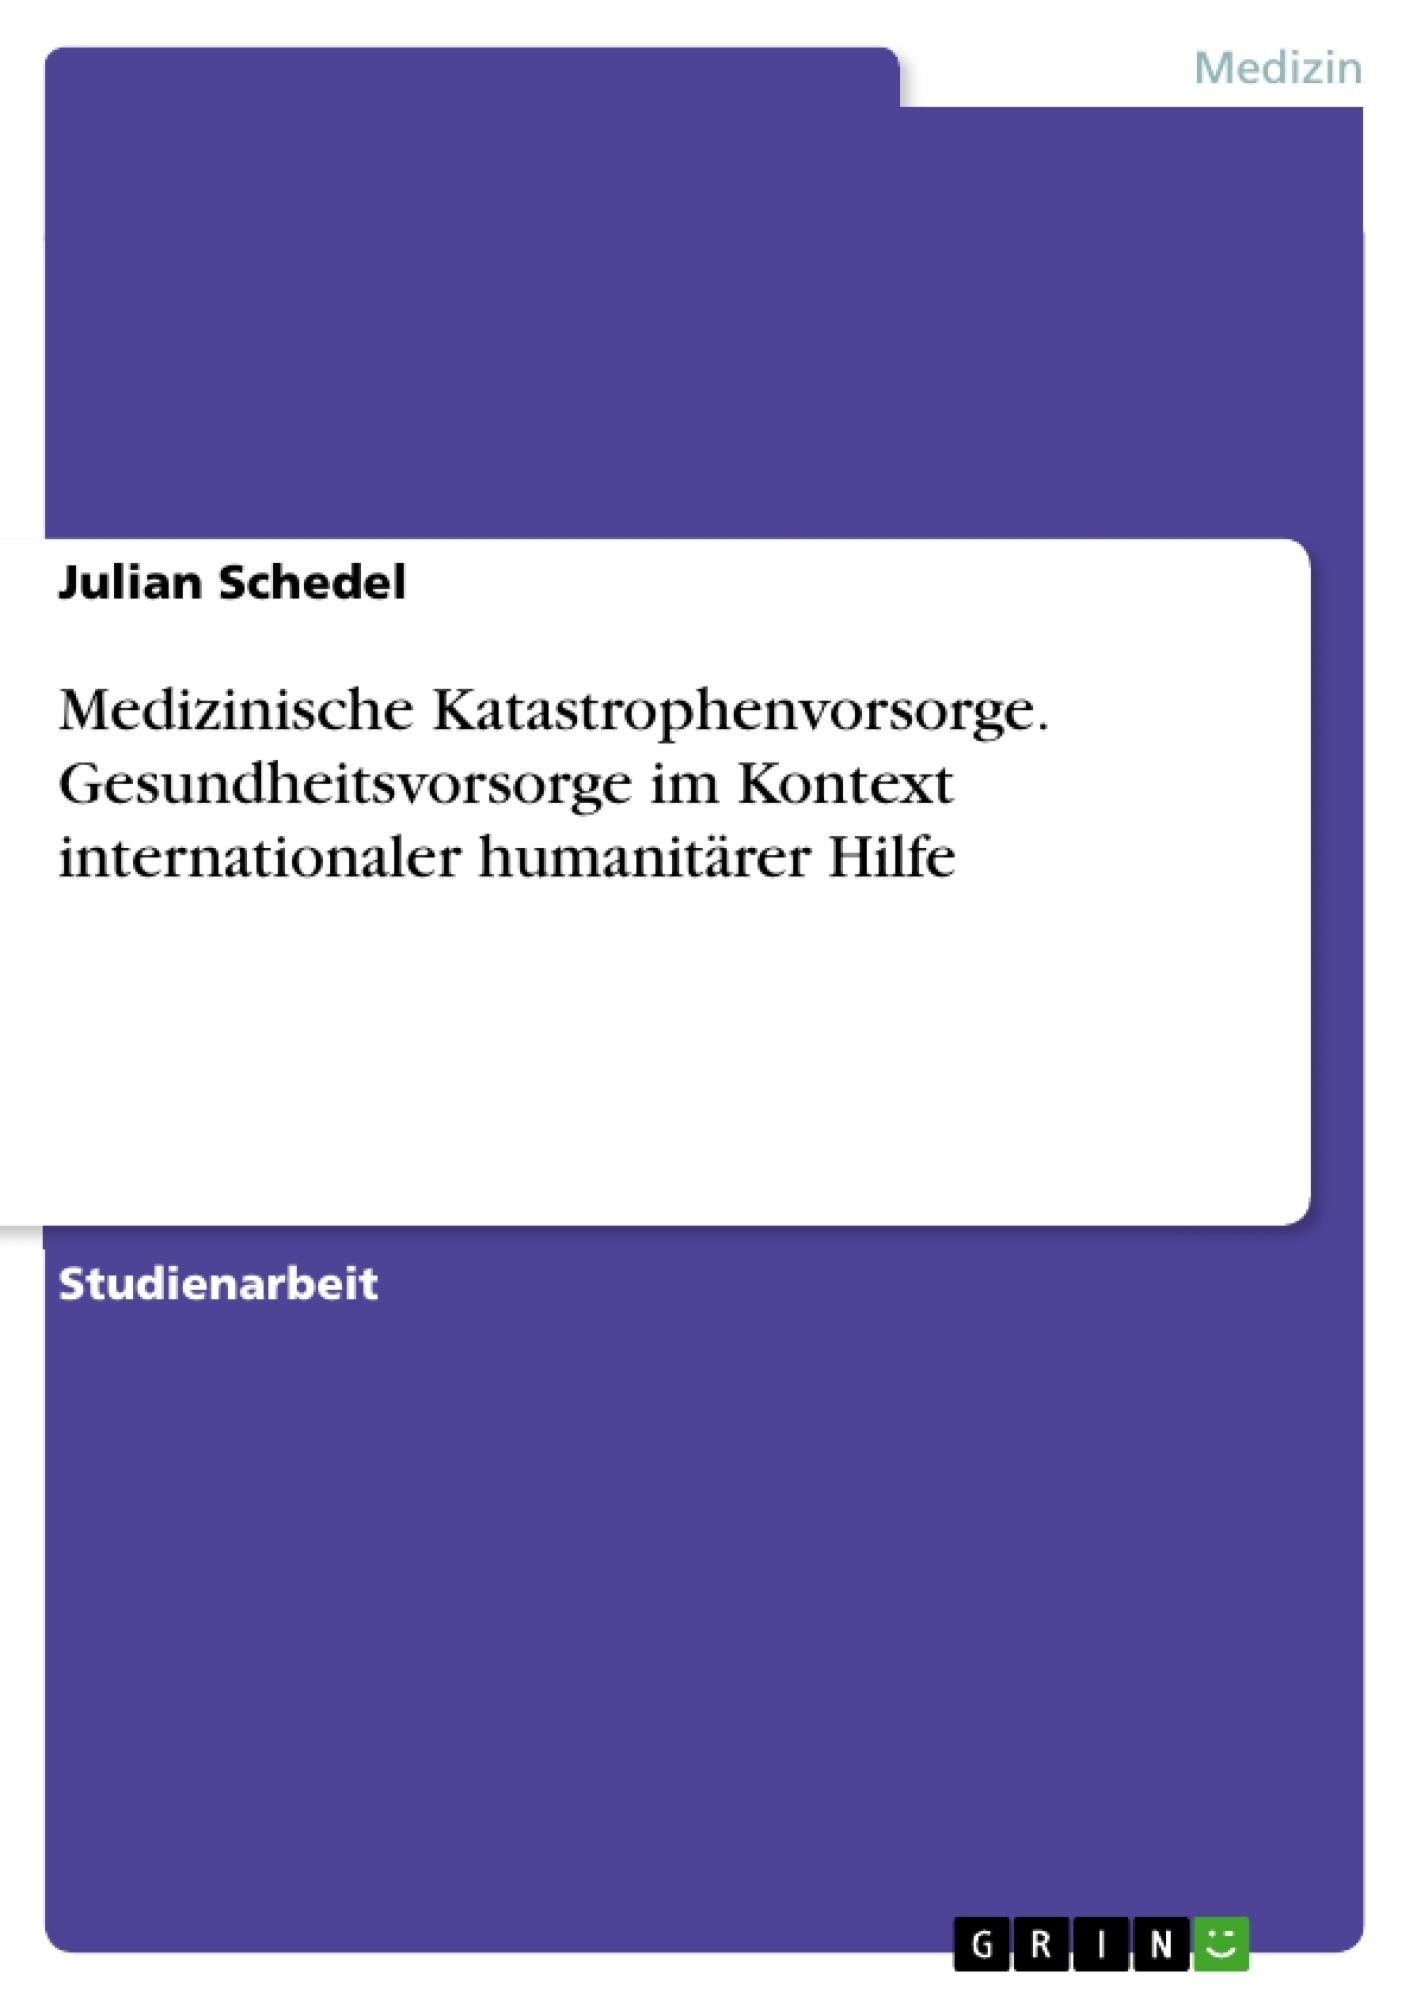 Titel: Medizinische Katastrophenvorsorge. Gesundheitsvorsorge im Kontext internationaler humanitärer Hilfe